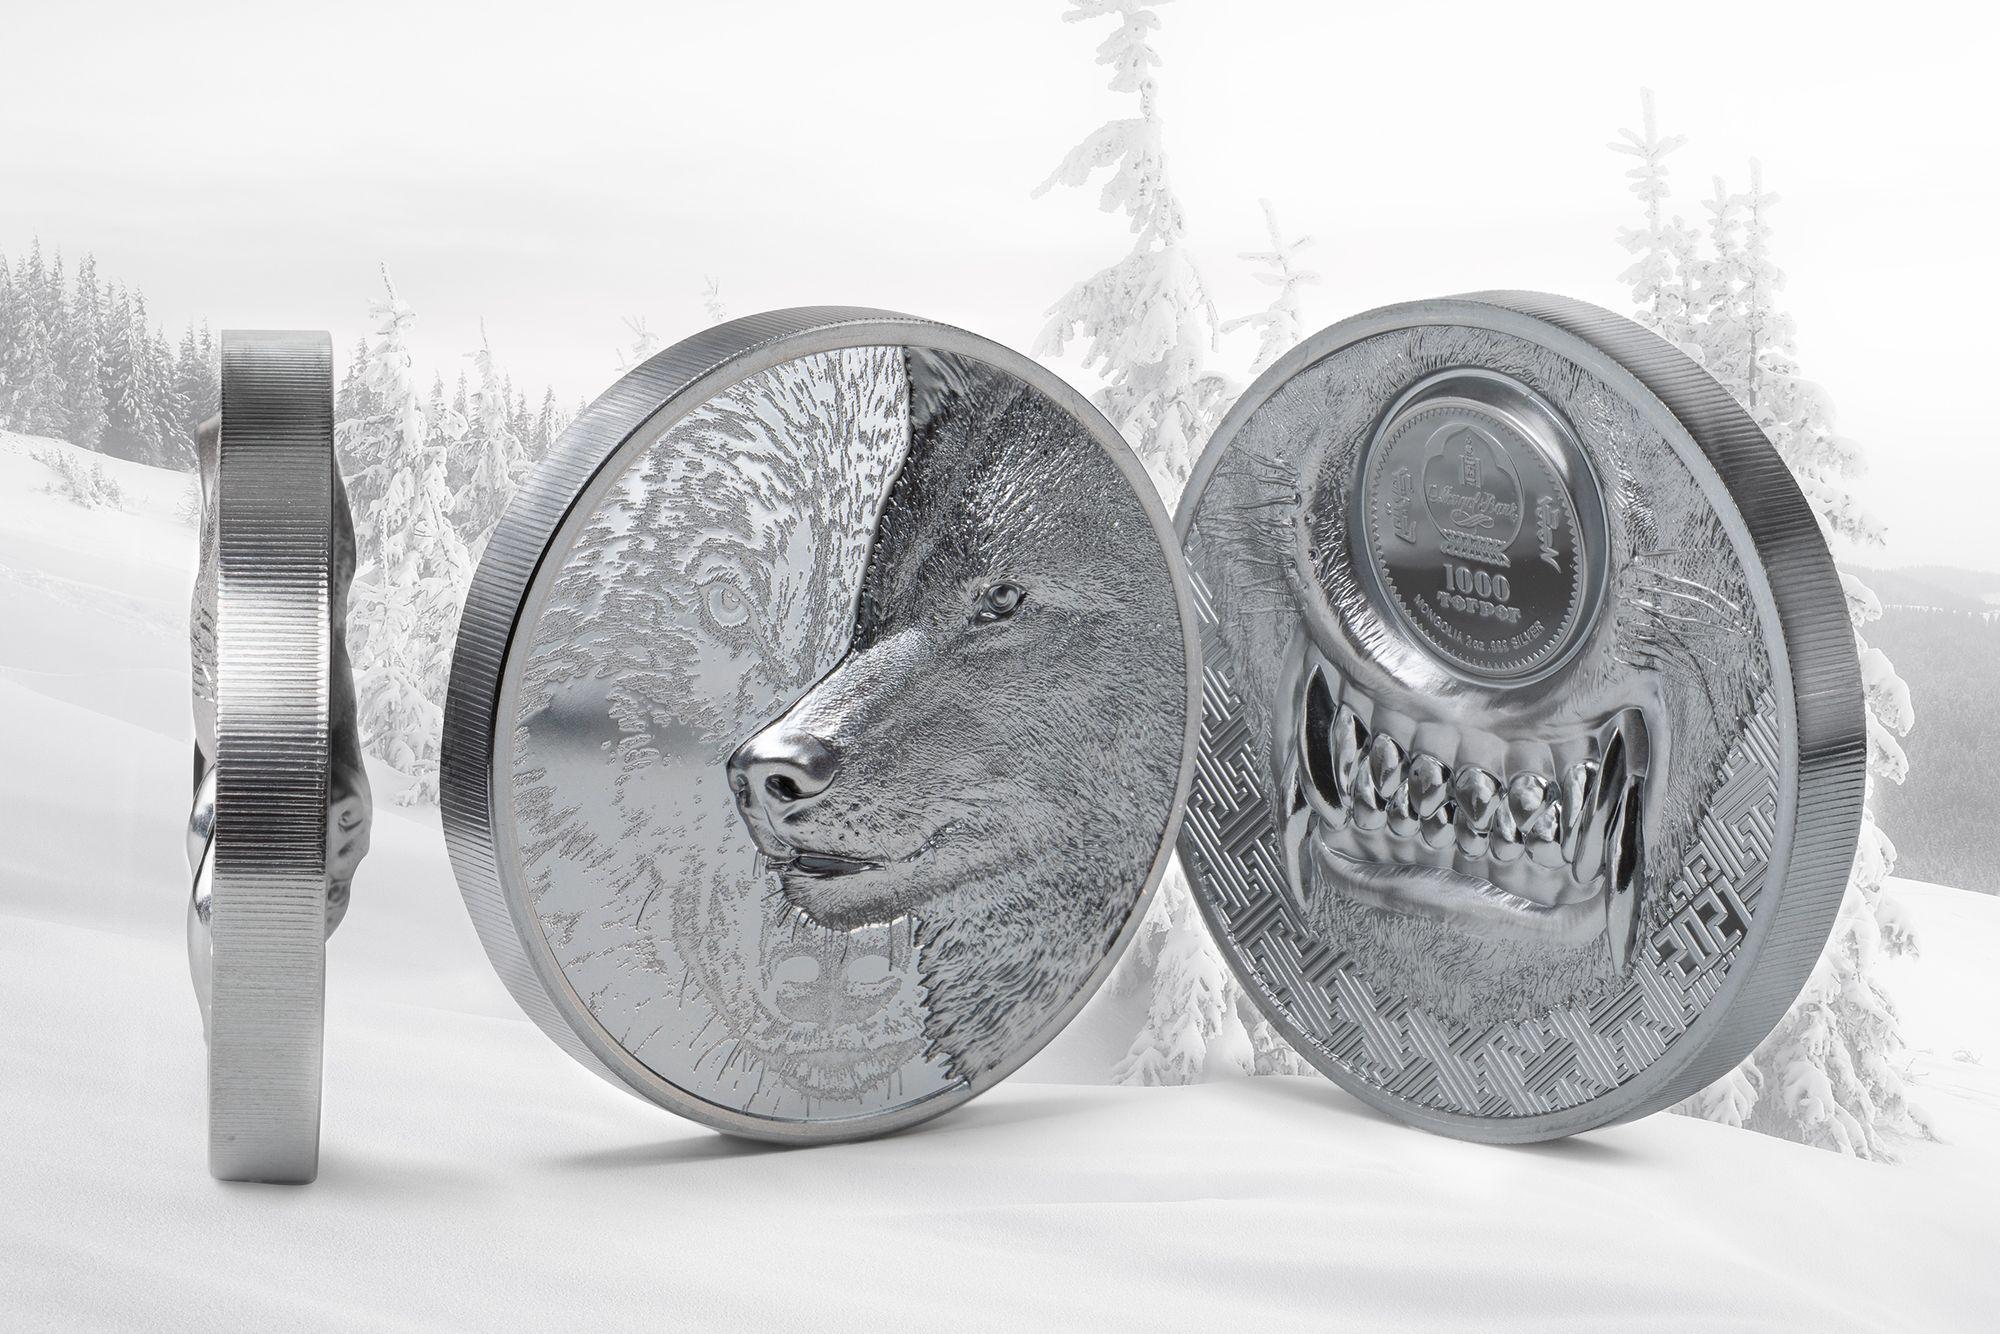 29569_Mystic-Wolf-Silver-2oz-Black-Proof_s